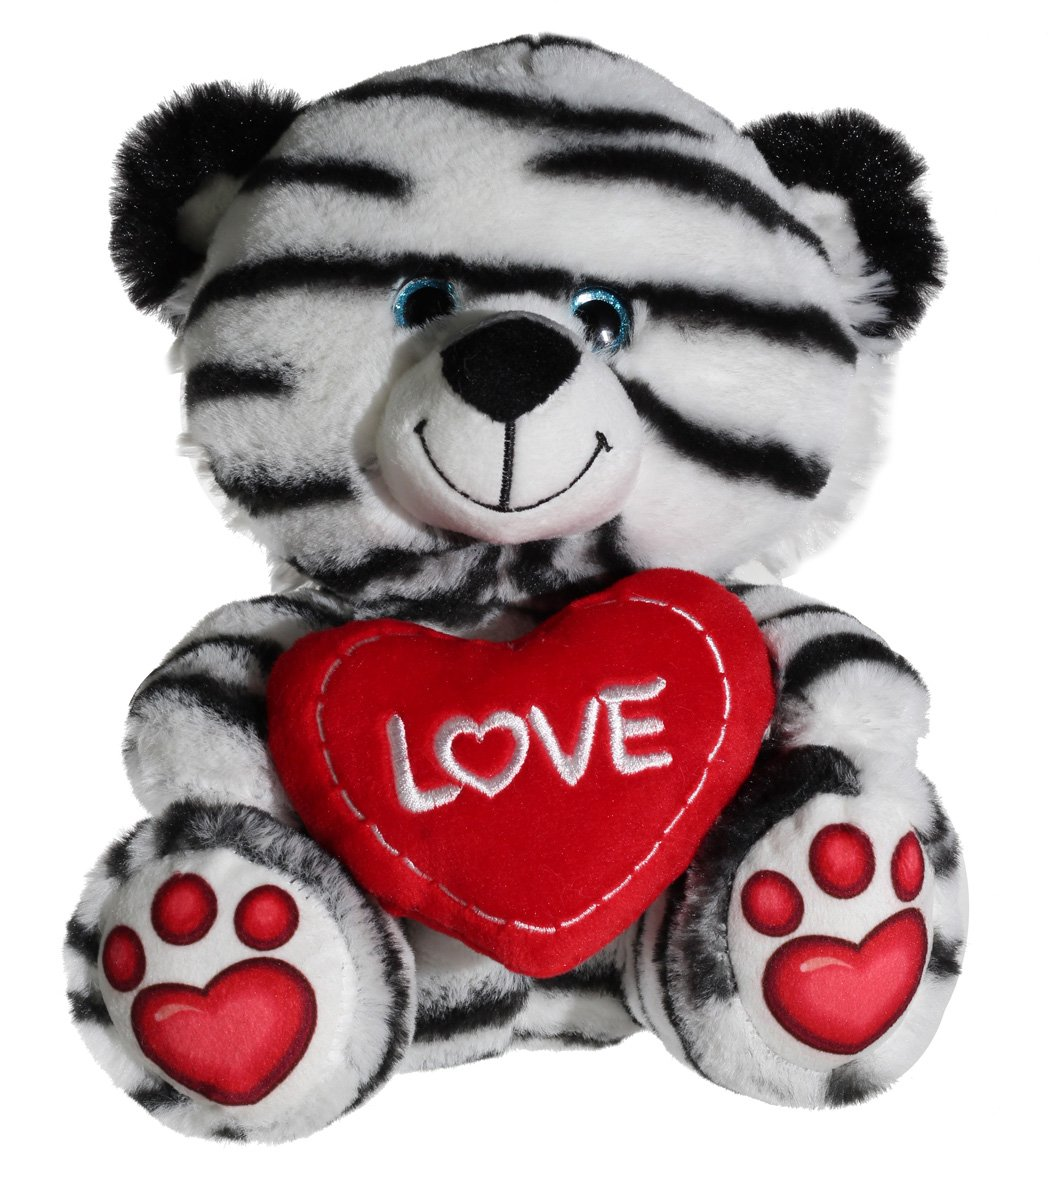 Calplush Valentine Friends 9 Striped Bear Plush Animal Toy NIXEU V1061-9